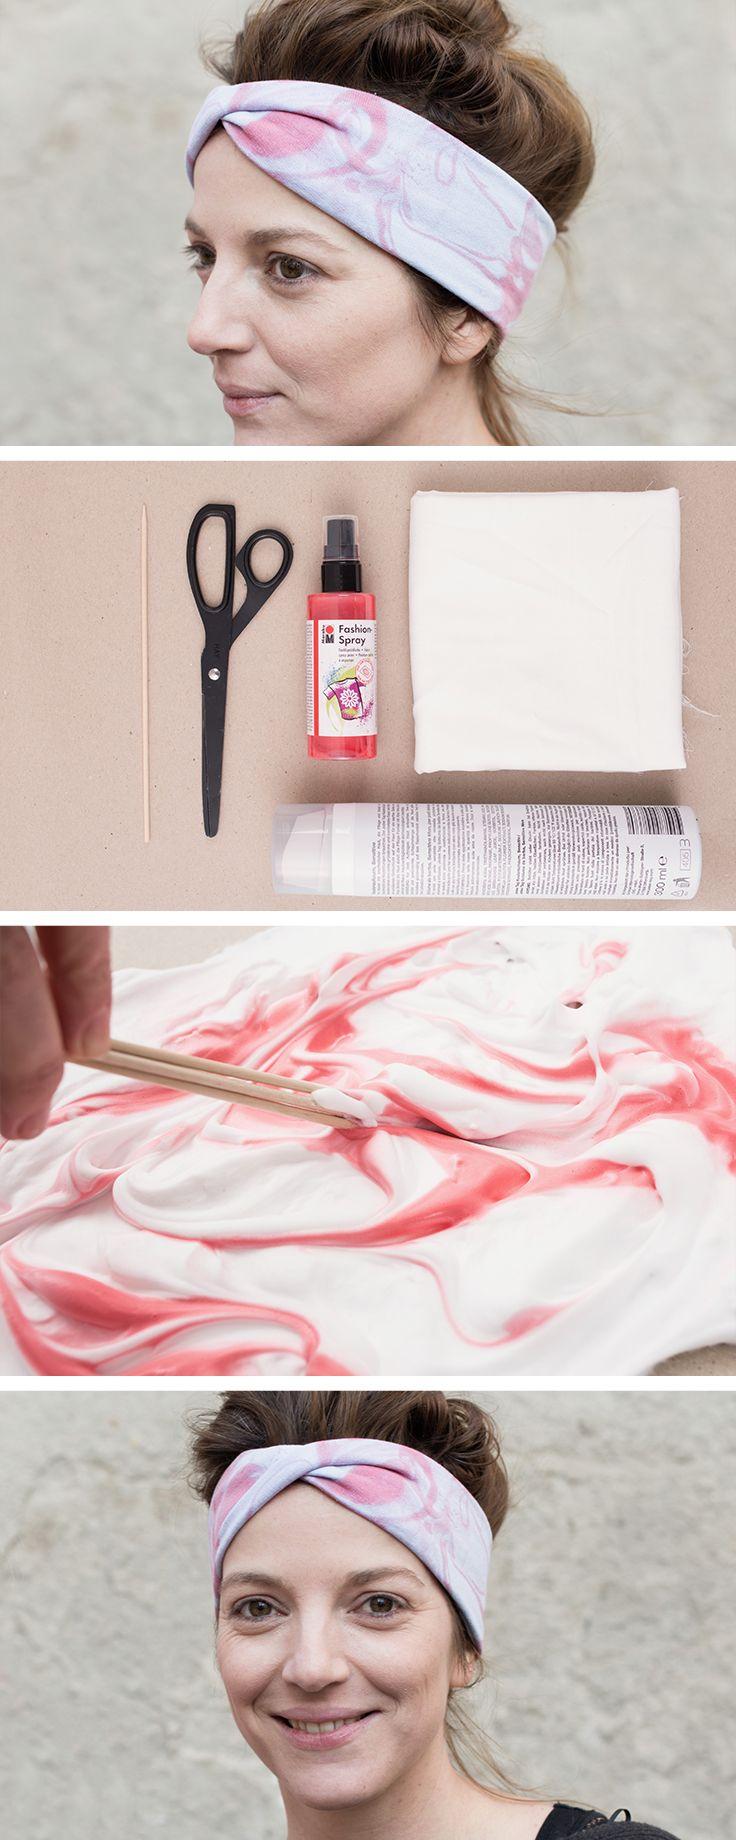 M s de 25 ideas incre bles sobre como hacer diademas en - Pintura efecto marmol ...